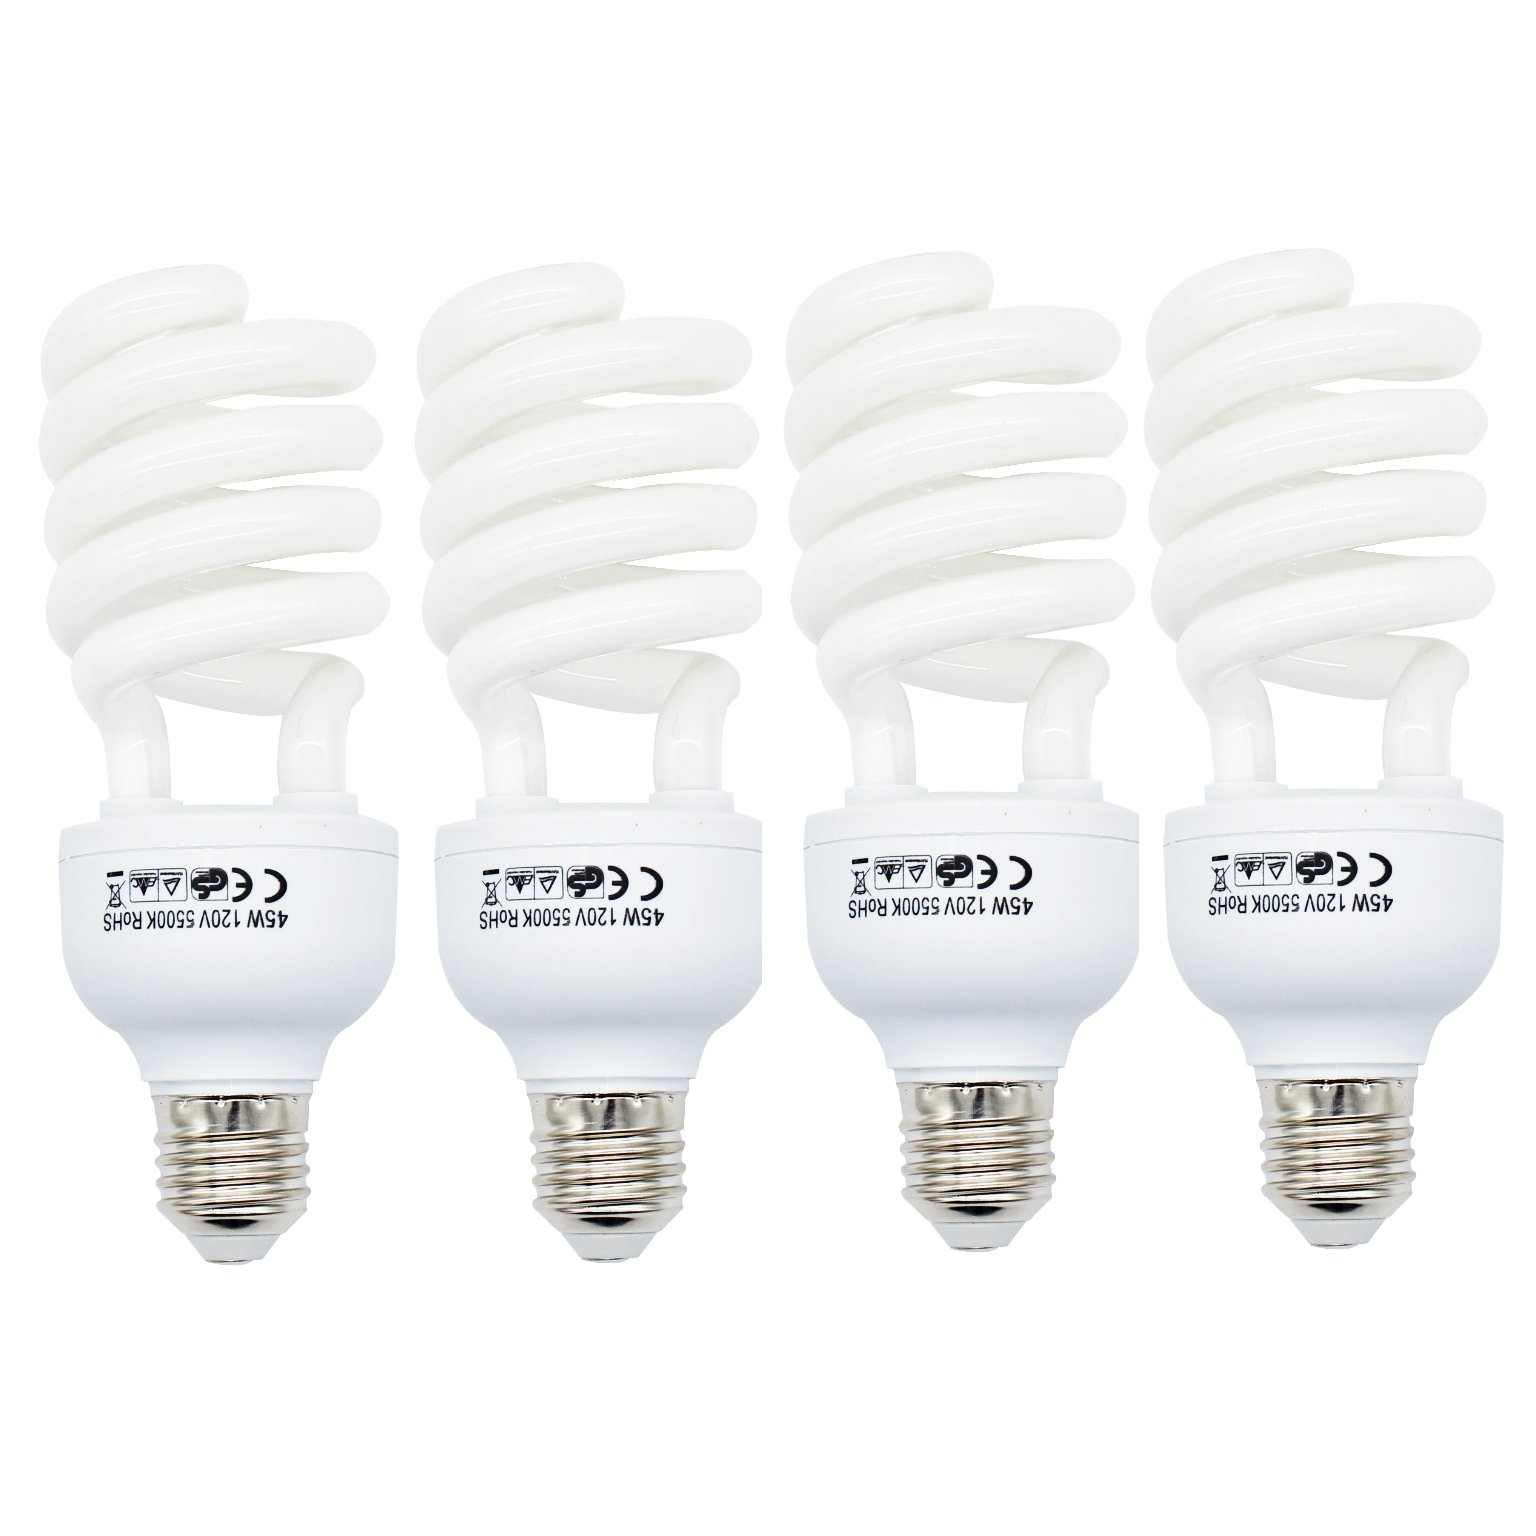 Foto&Tech 45 Watt Daylight Fluorescent photography Spiral Light Bulb 5500K 110V White for Photography and Video Studio Lighting (4 Pack)